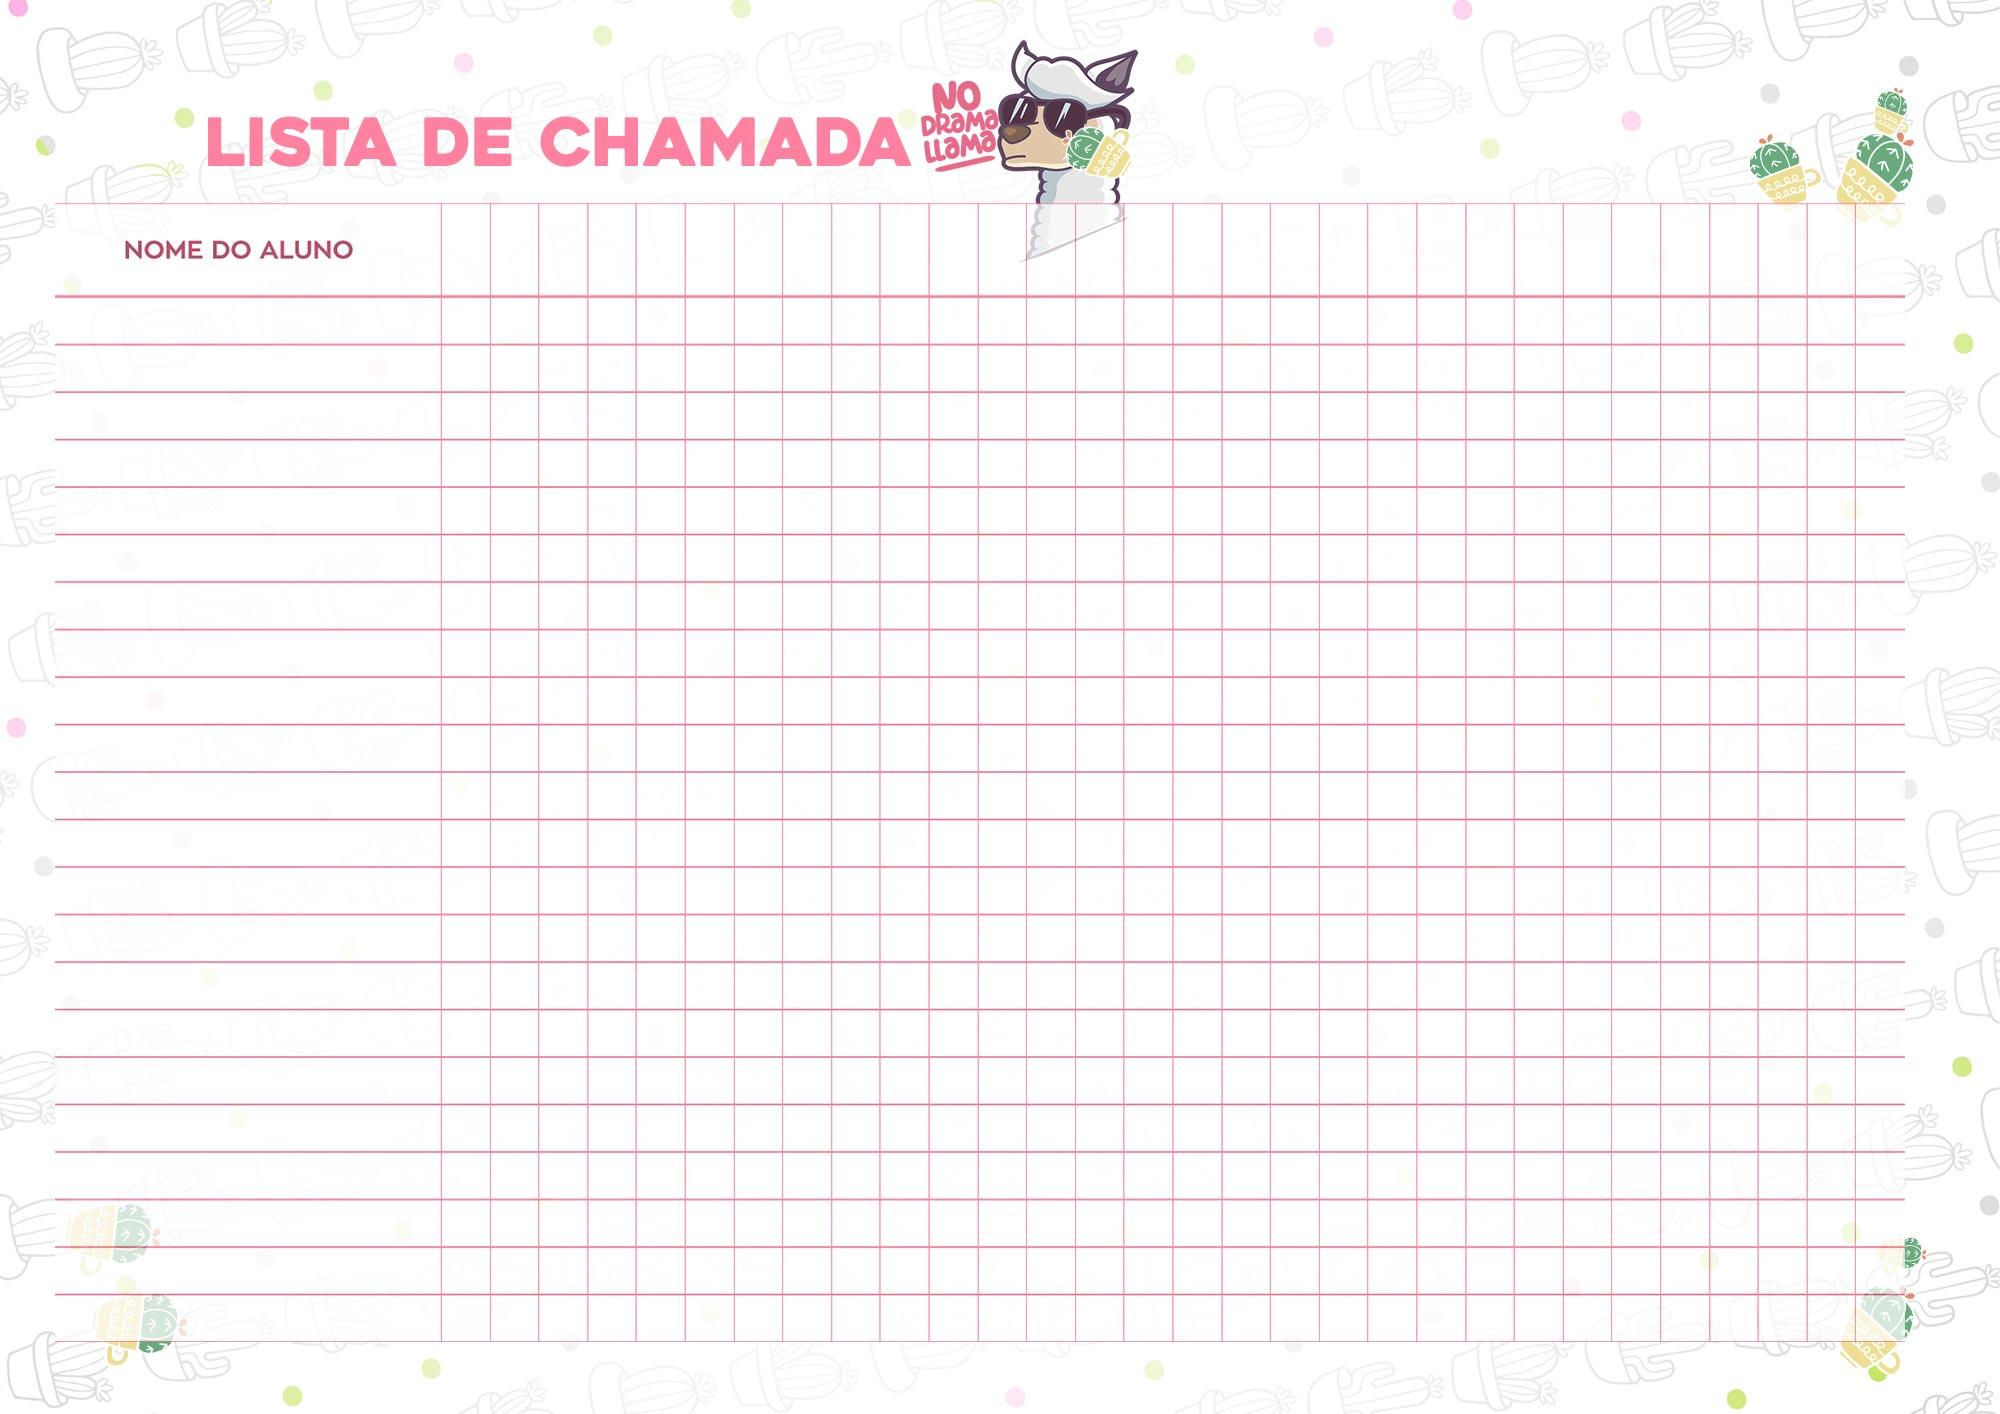 Planner Professor Lhama Lista de Chamada